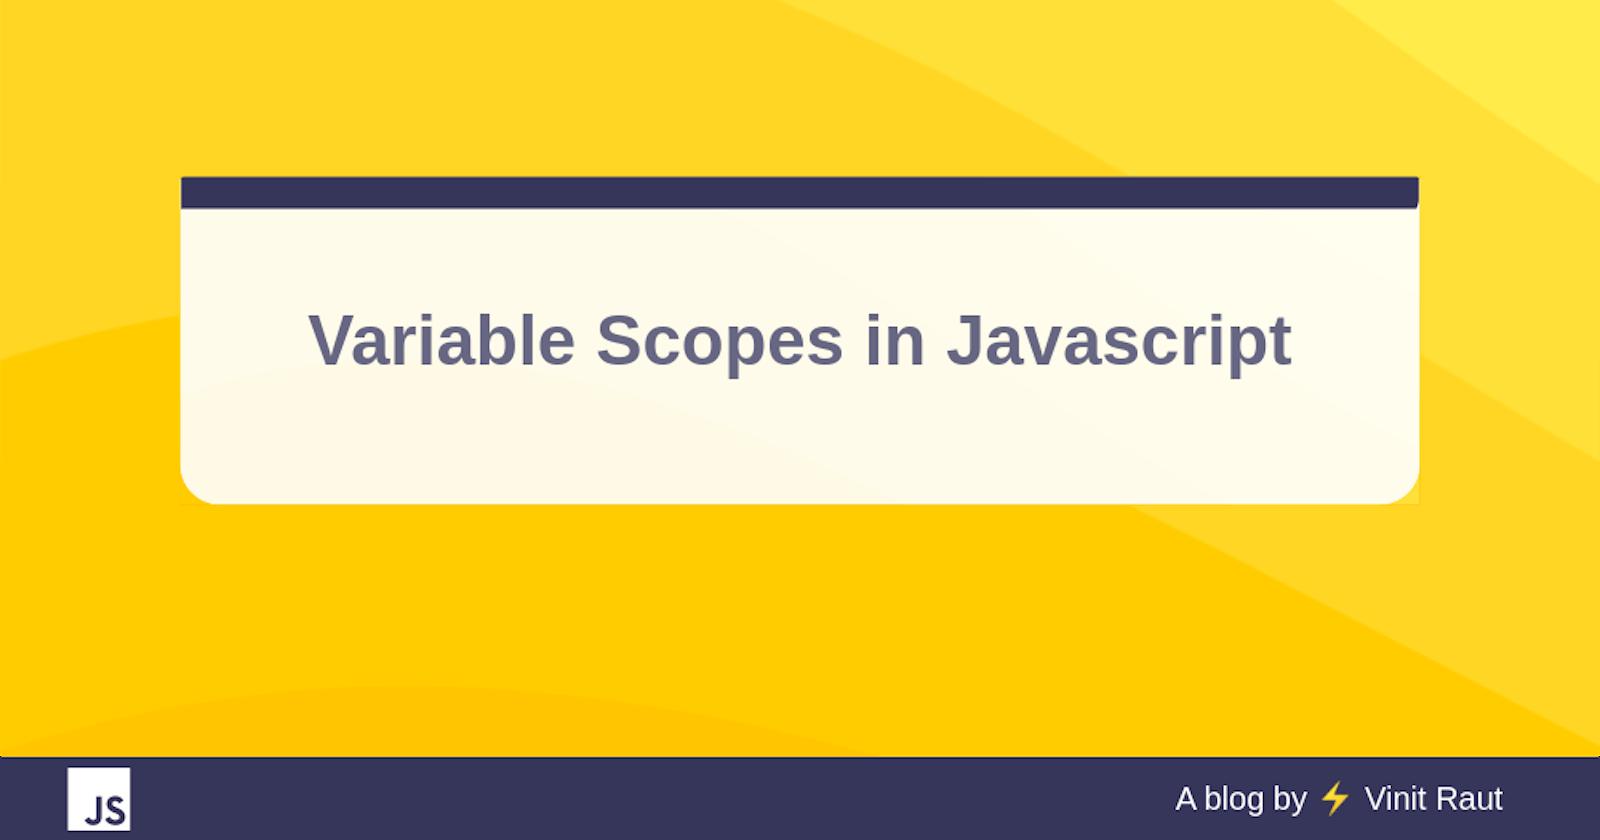 Variable Scopes in Javascript